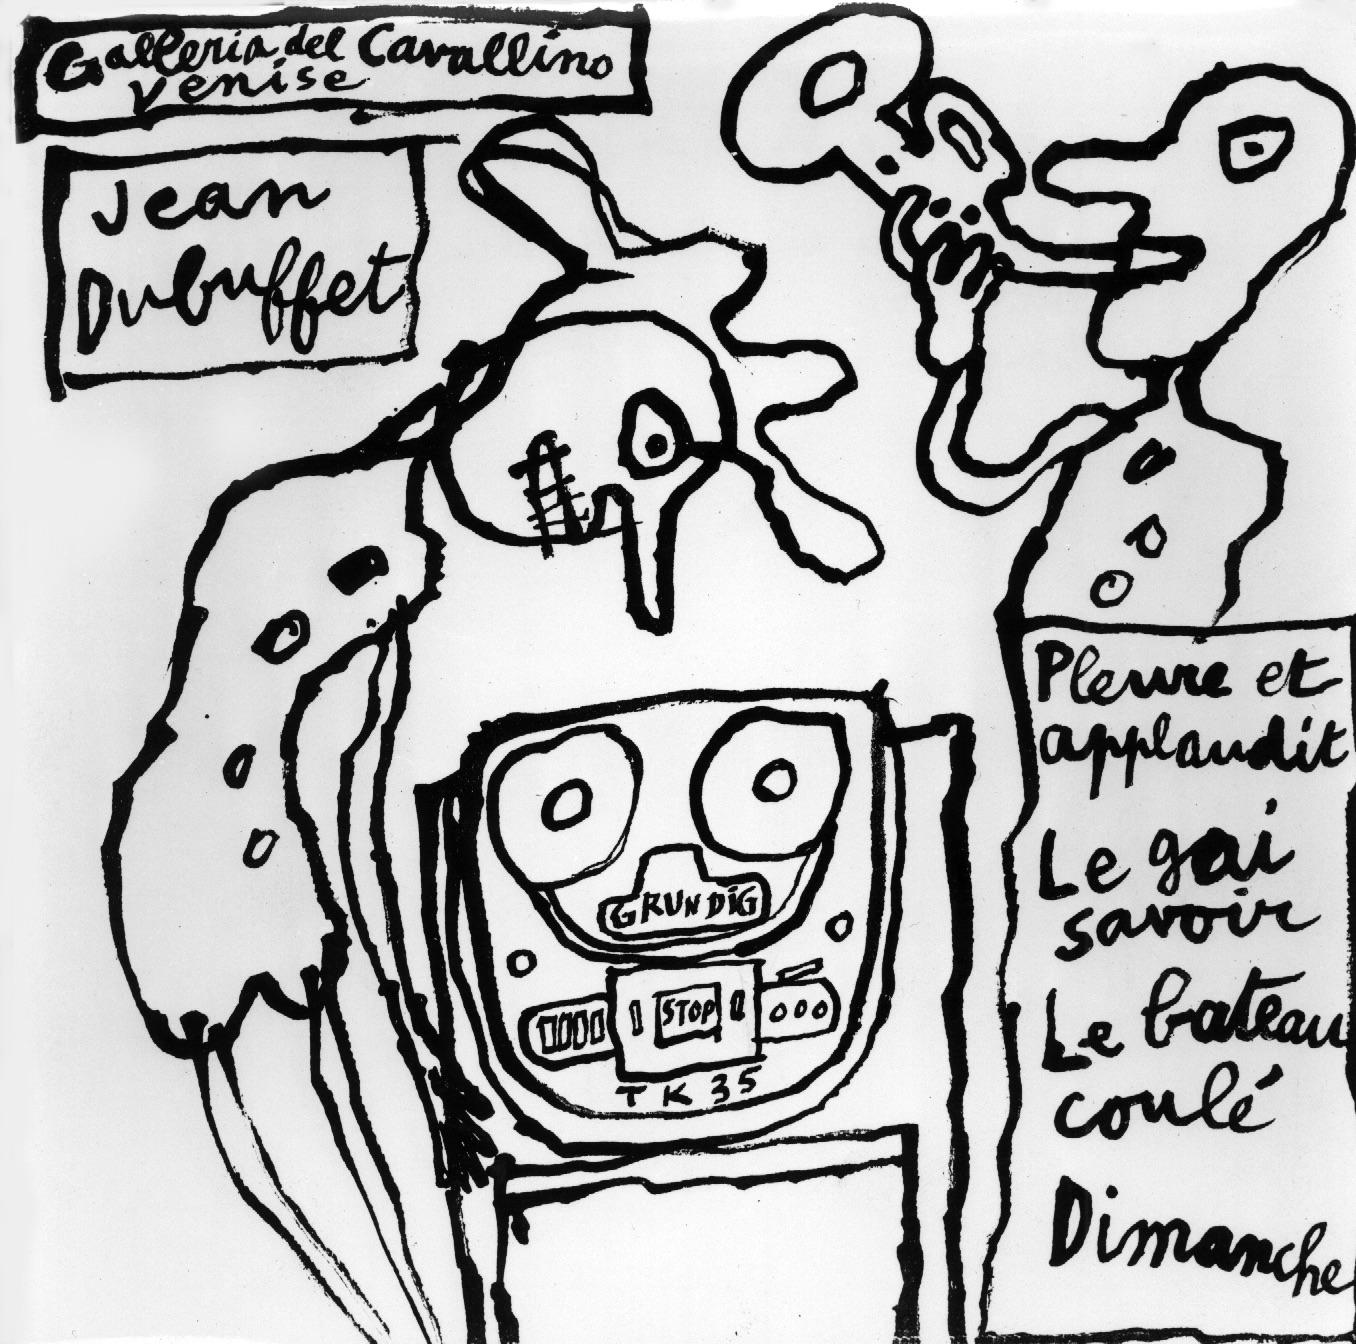 Jean Dubuffet Tommaso Calabro